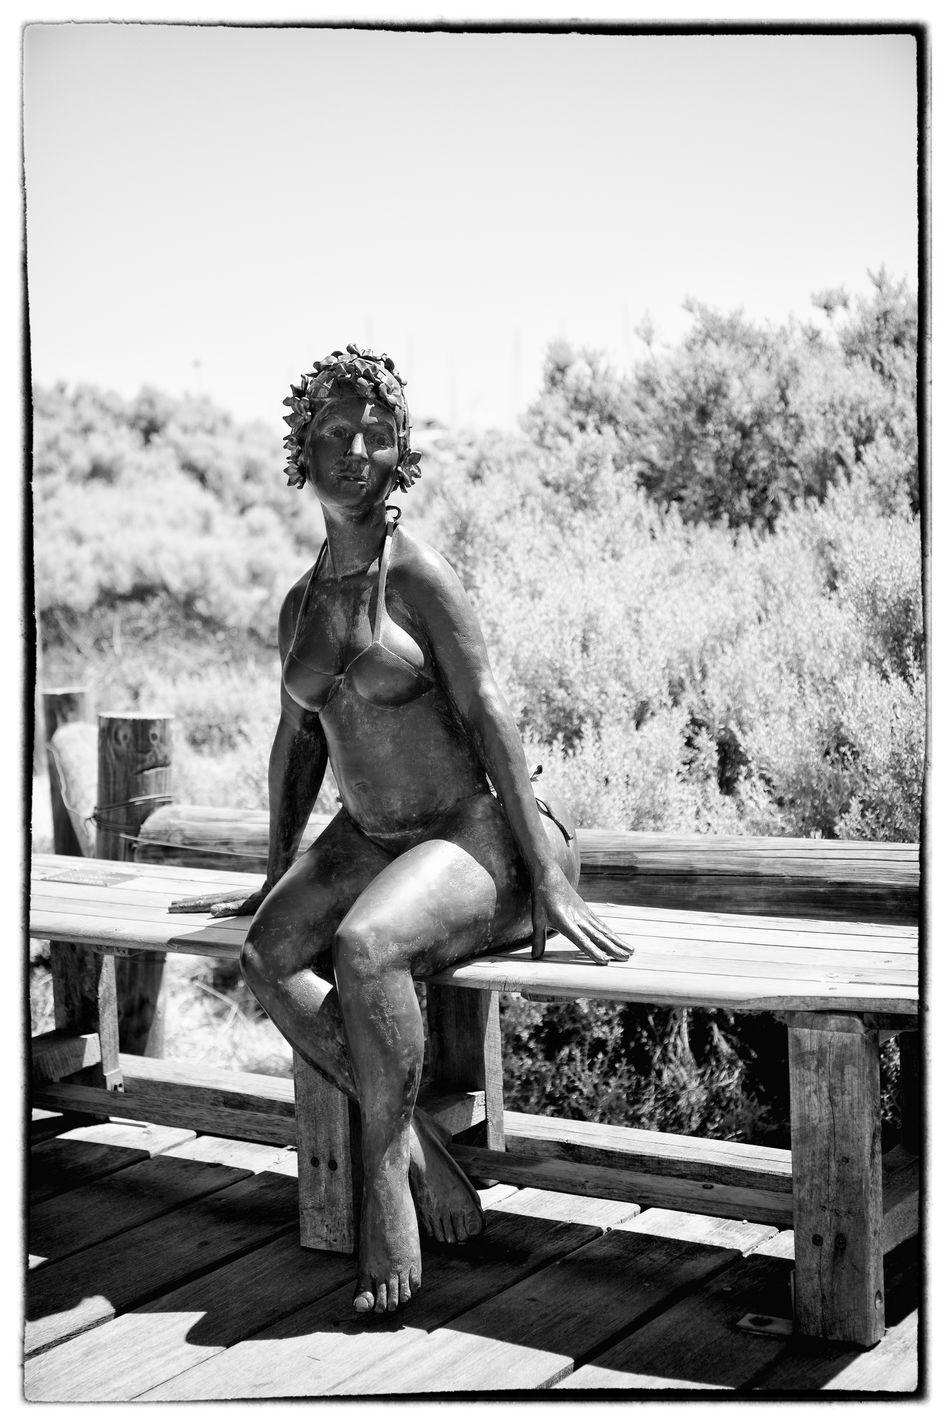 24-70mm Beach Black And White Blackandwhite Blackandwhite Photography Border Brass Canon Canonphotography Freemantle High Contrast Monochrome Sitting Statue Swimsuit Western Australia Woman